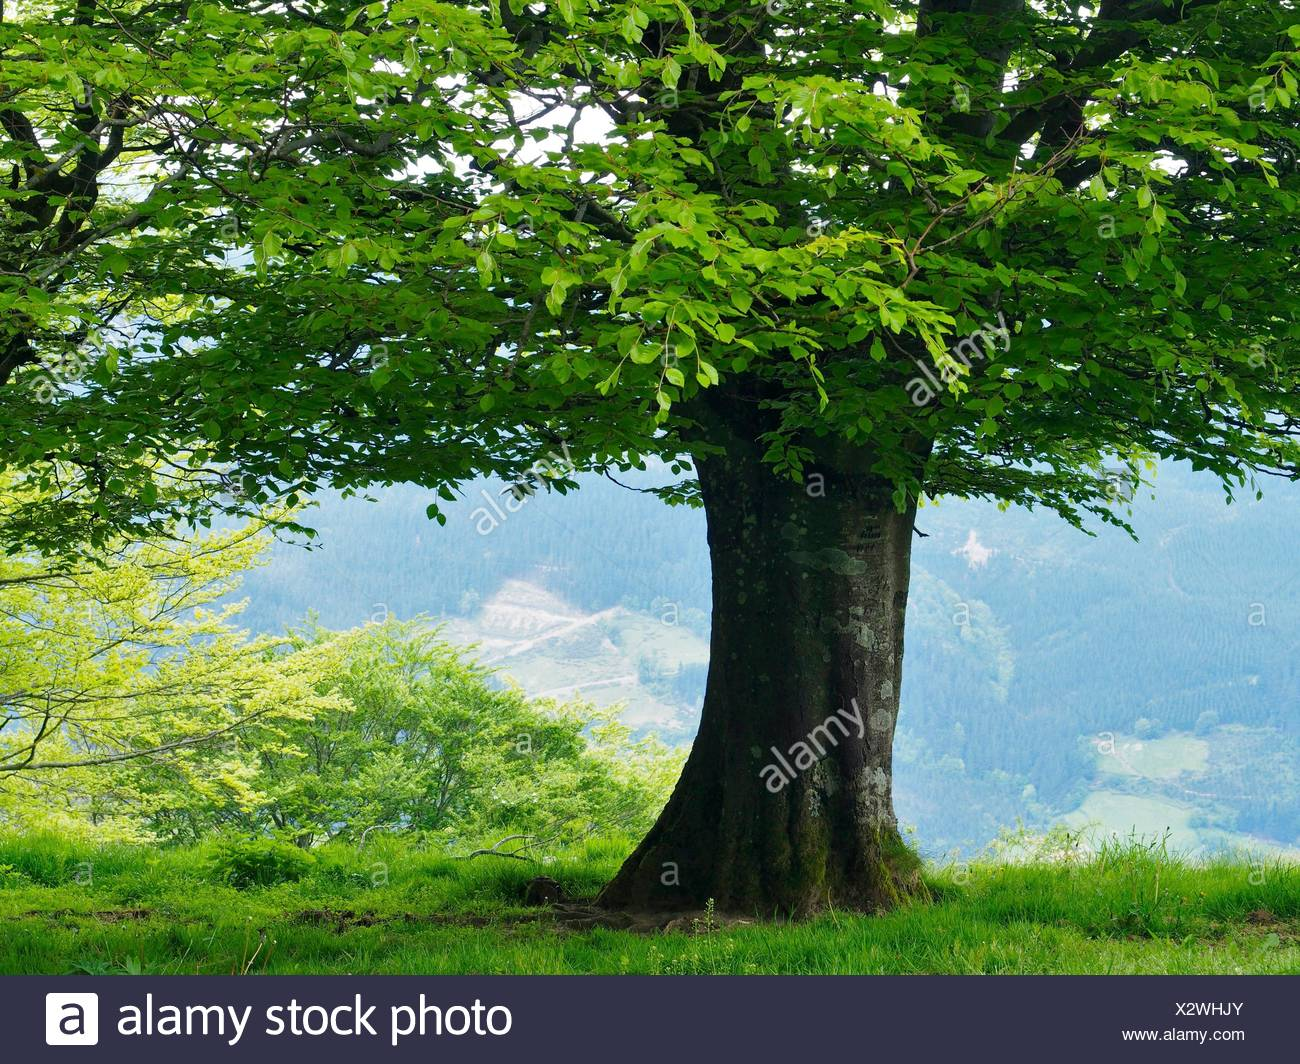 Beech tree (Fagus sylvatica). Anboto mountain. Urkiola Natural Park. Bizkaia province. Euskadi. Spain. - Stock Image